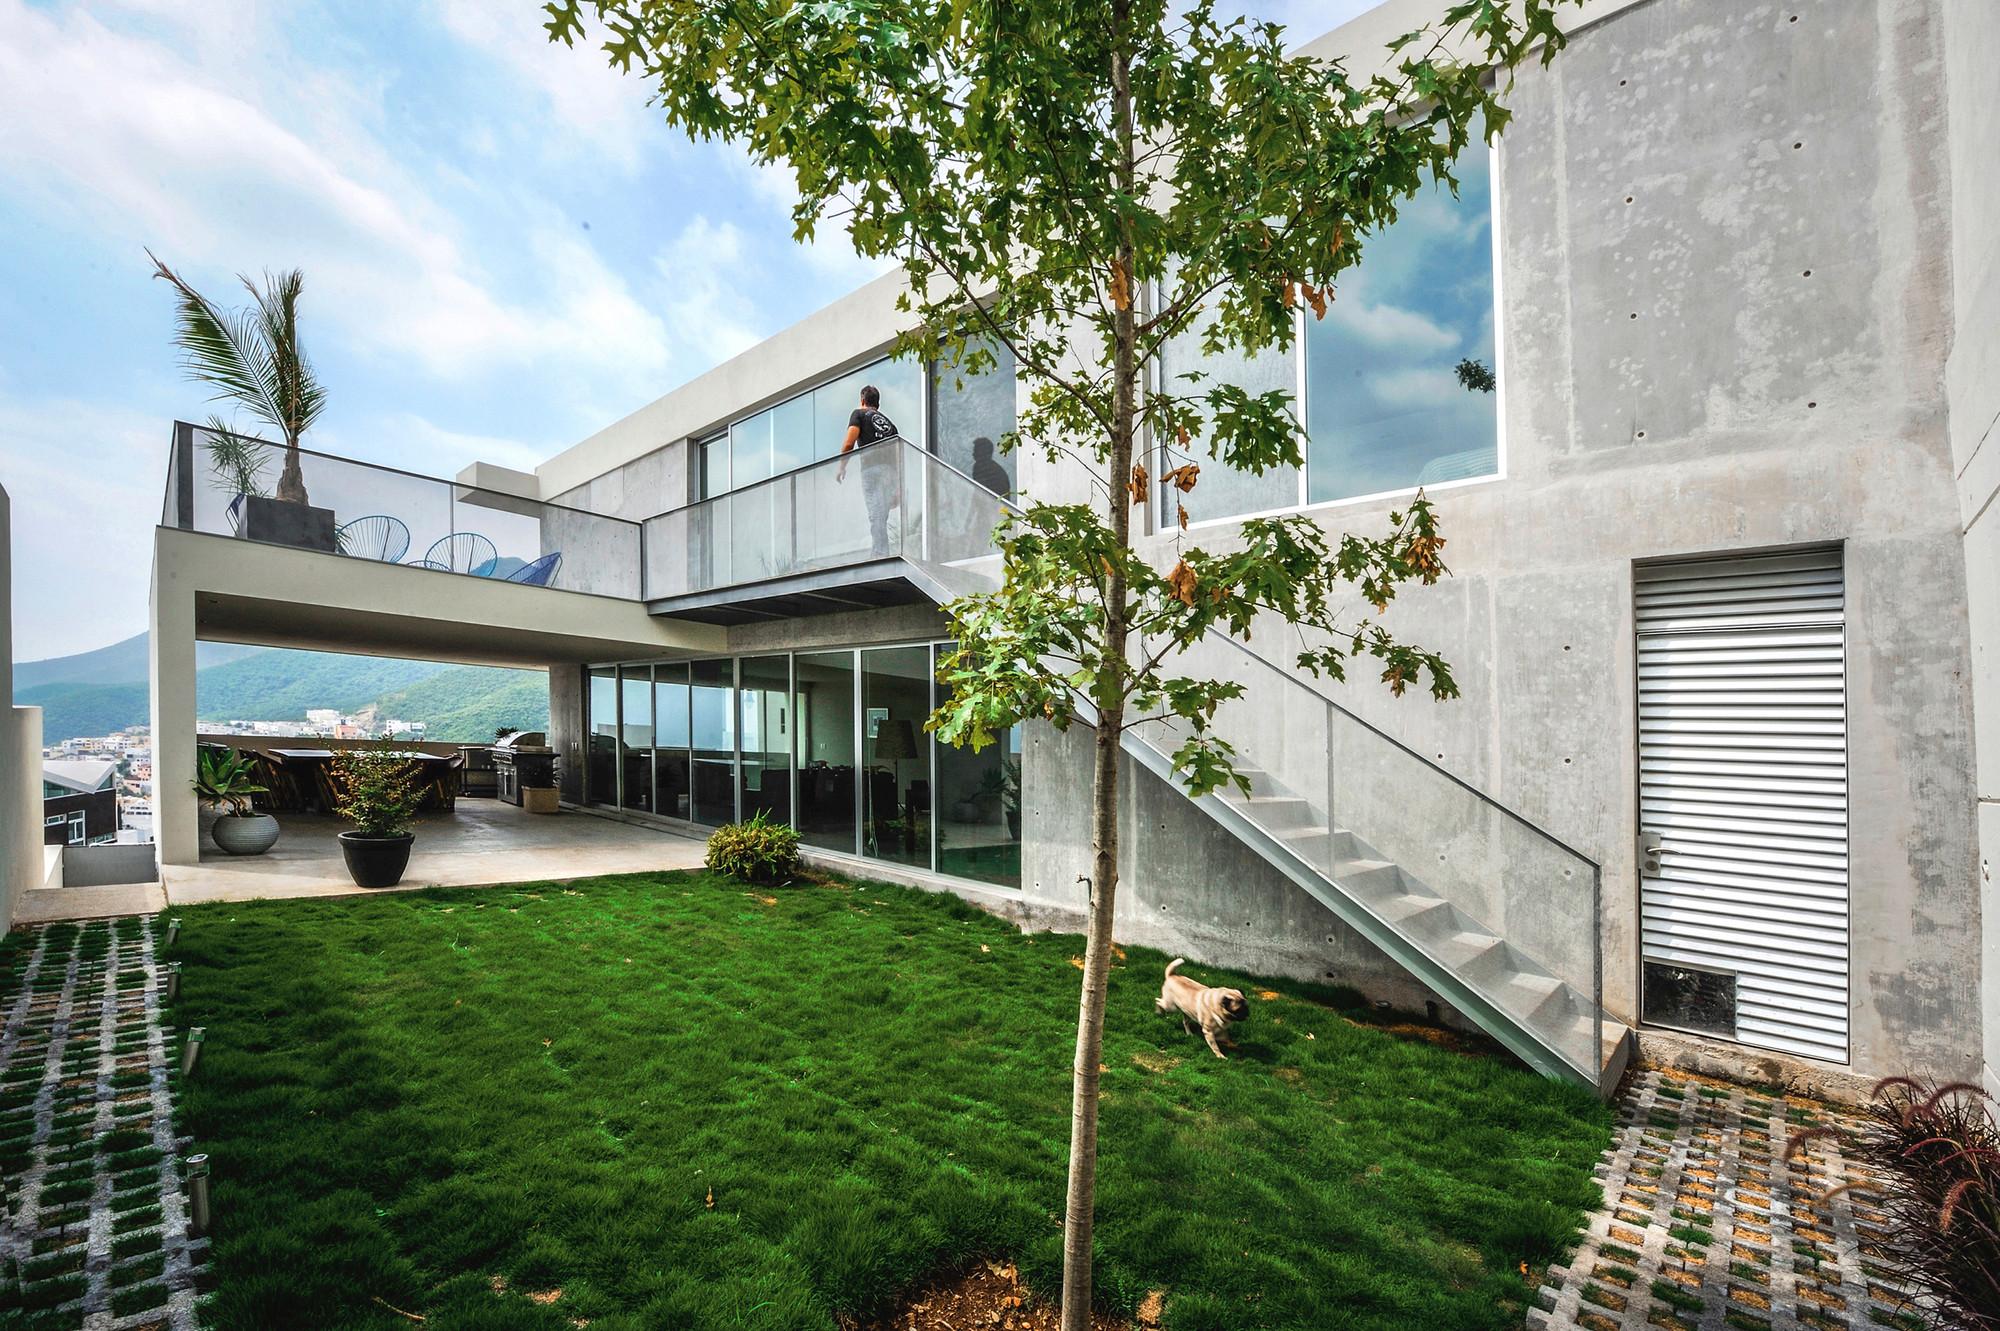 Casa ipe p 0 architecture plataforma arquitectura for Casa moderna jardin d el menzah